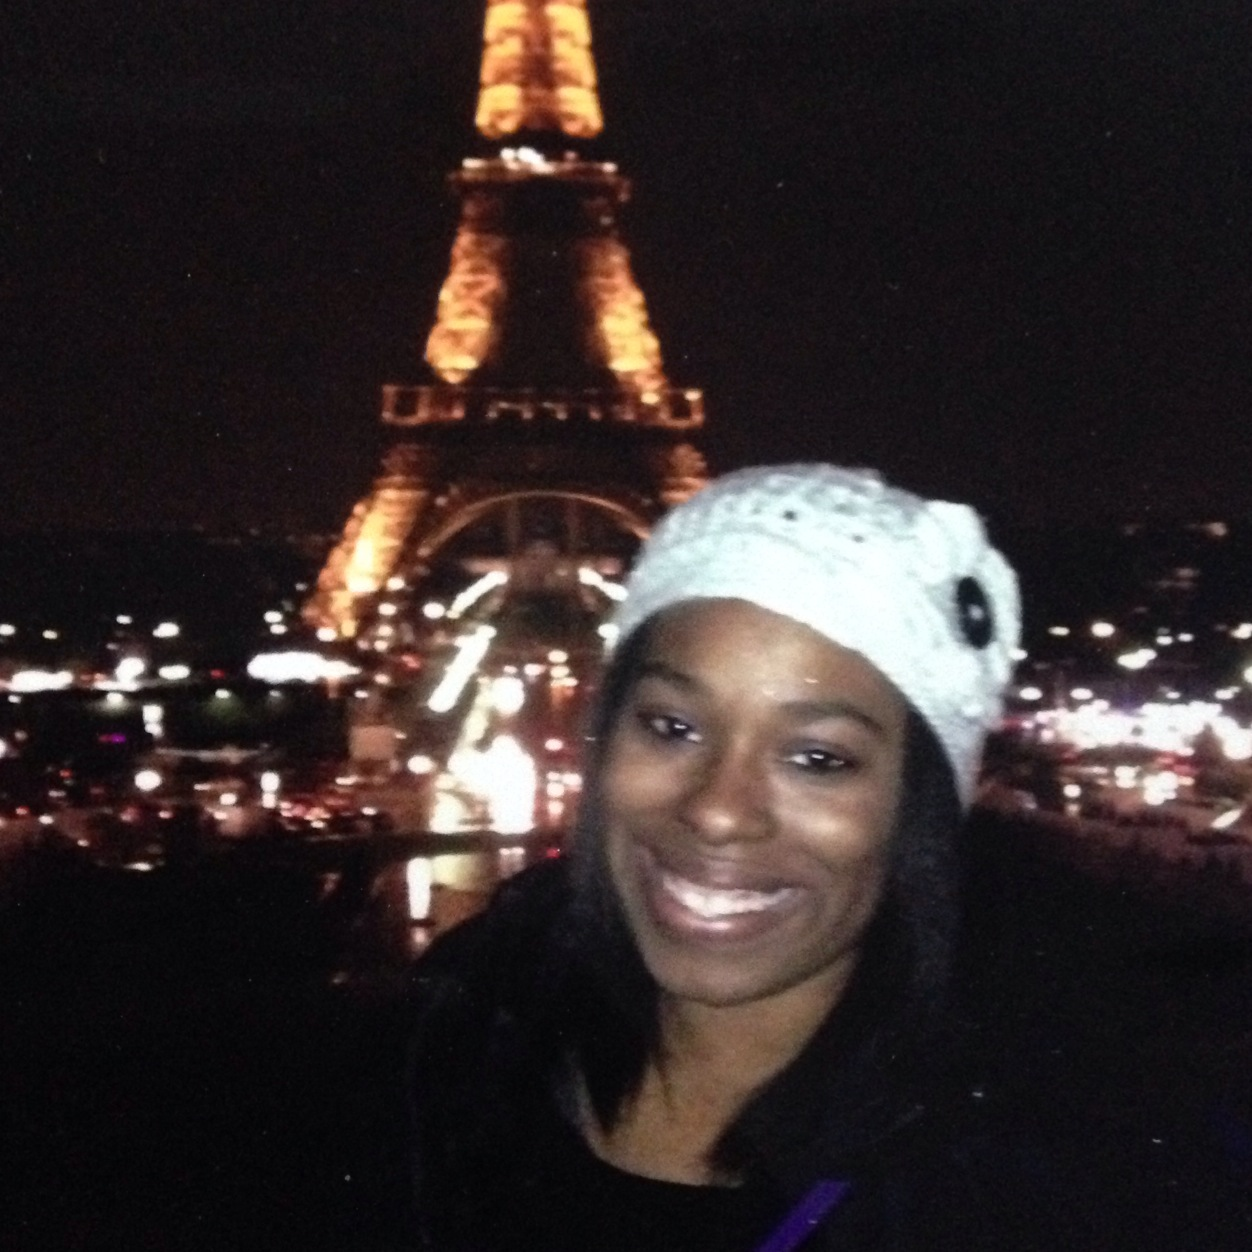 Visit Paris, France - December 24, 2013